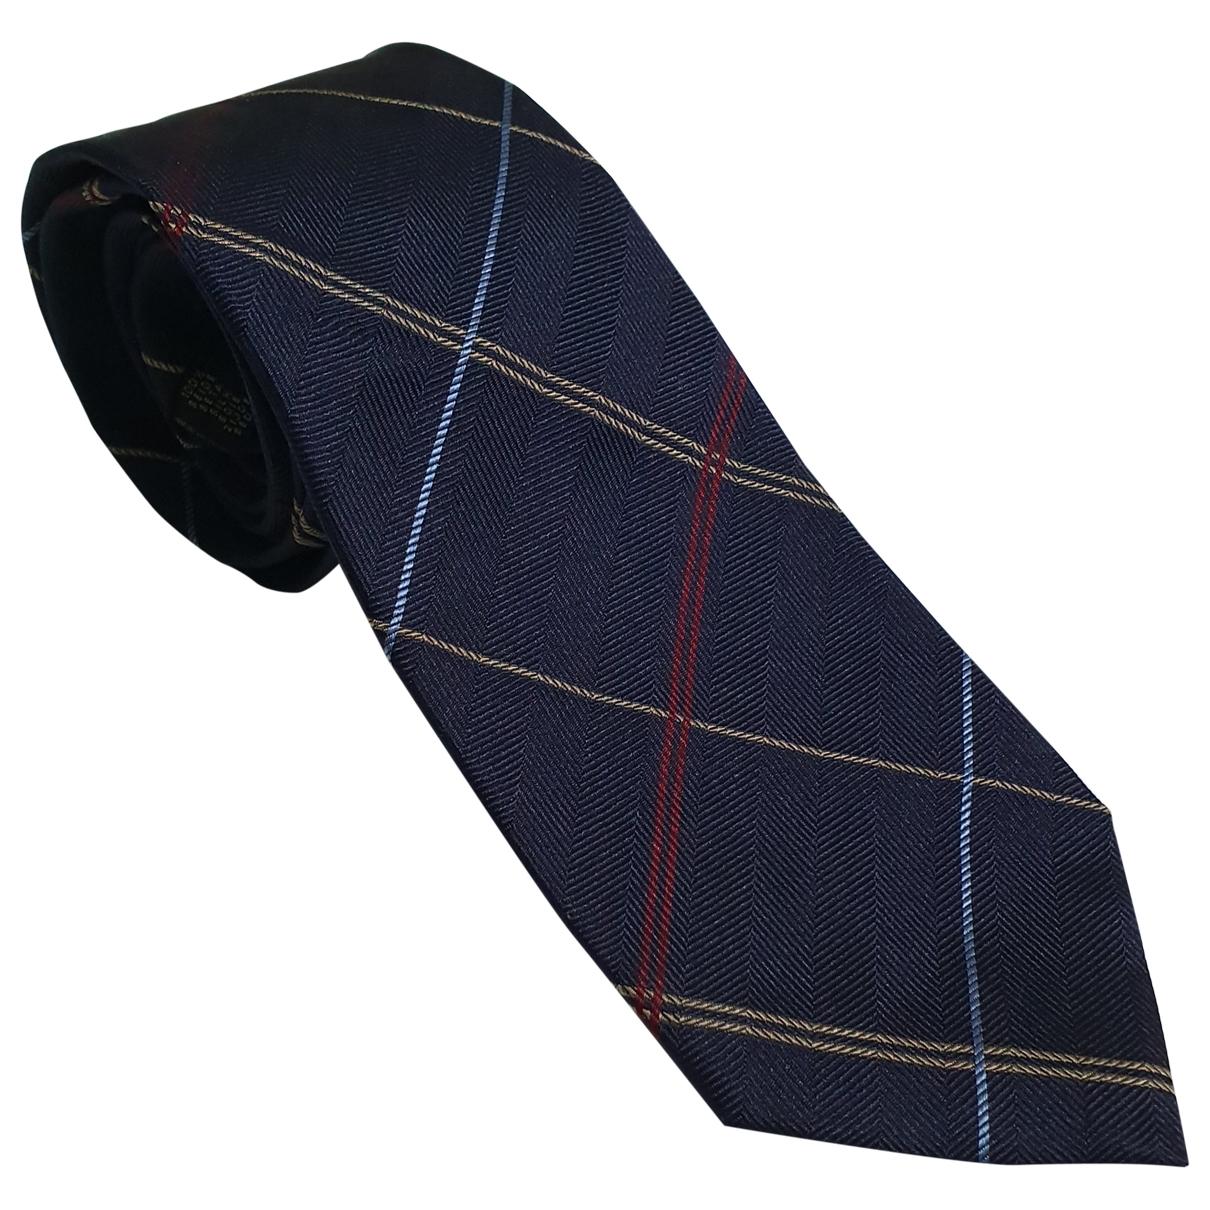 Corbata de Seda Abercrombie & Fitch